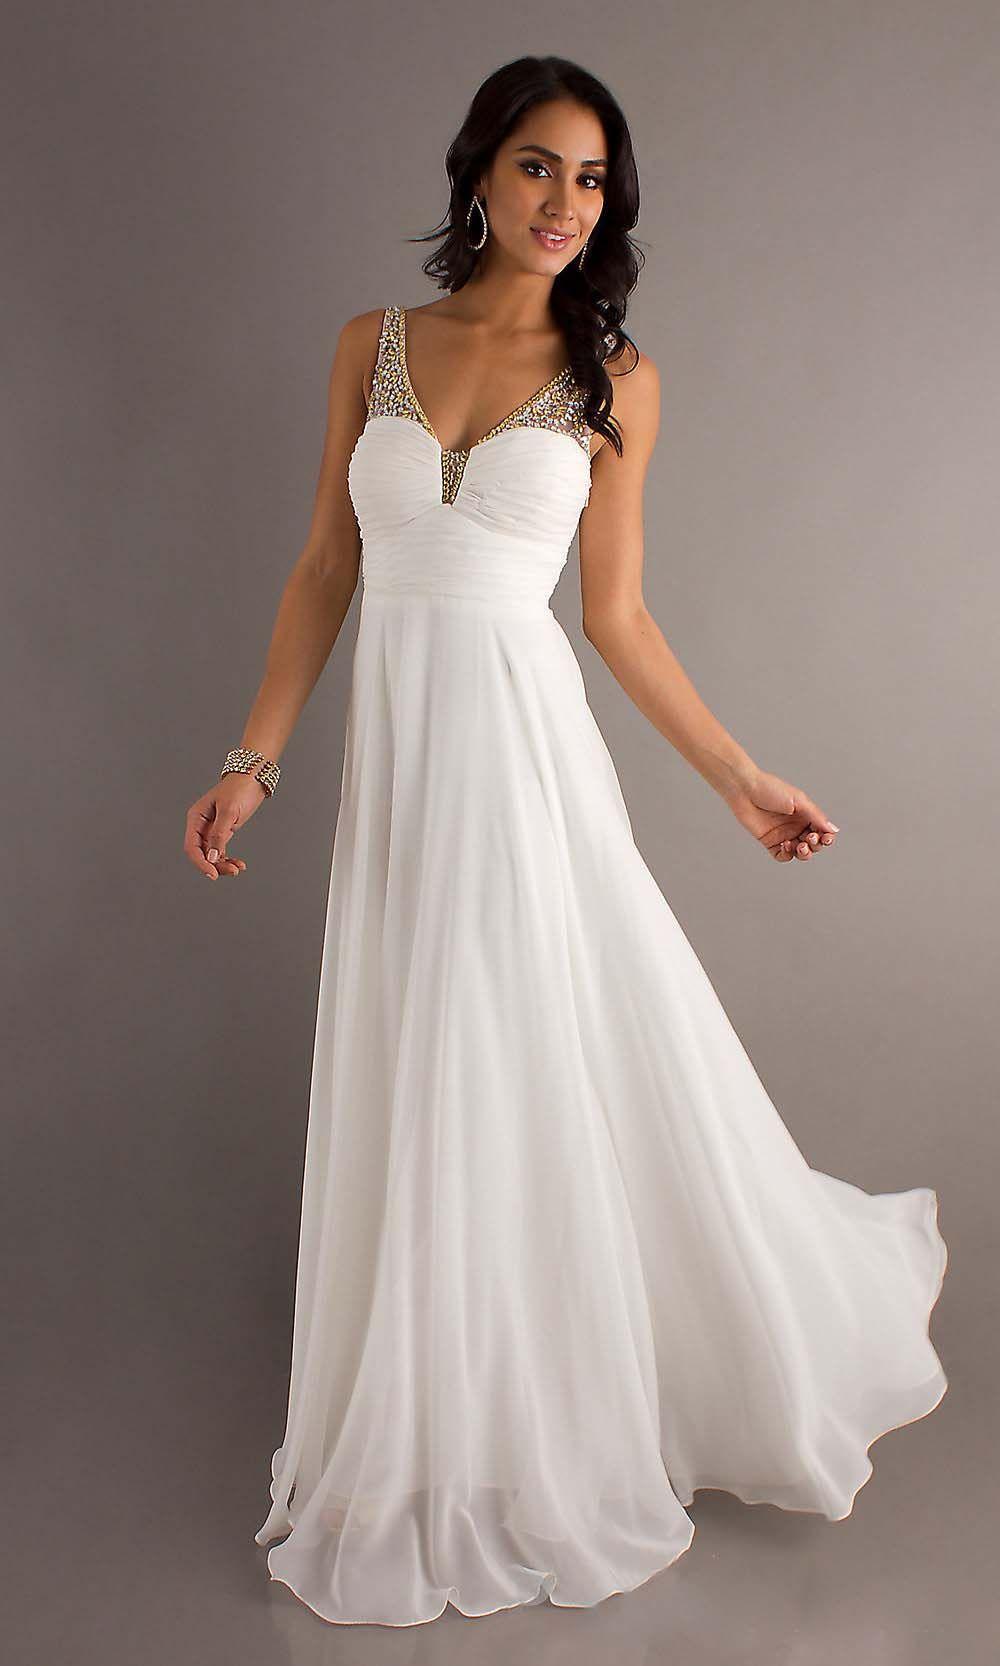 Wedding White Prom Dress images of white prom dress fashion trends and models kalsene fede